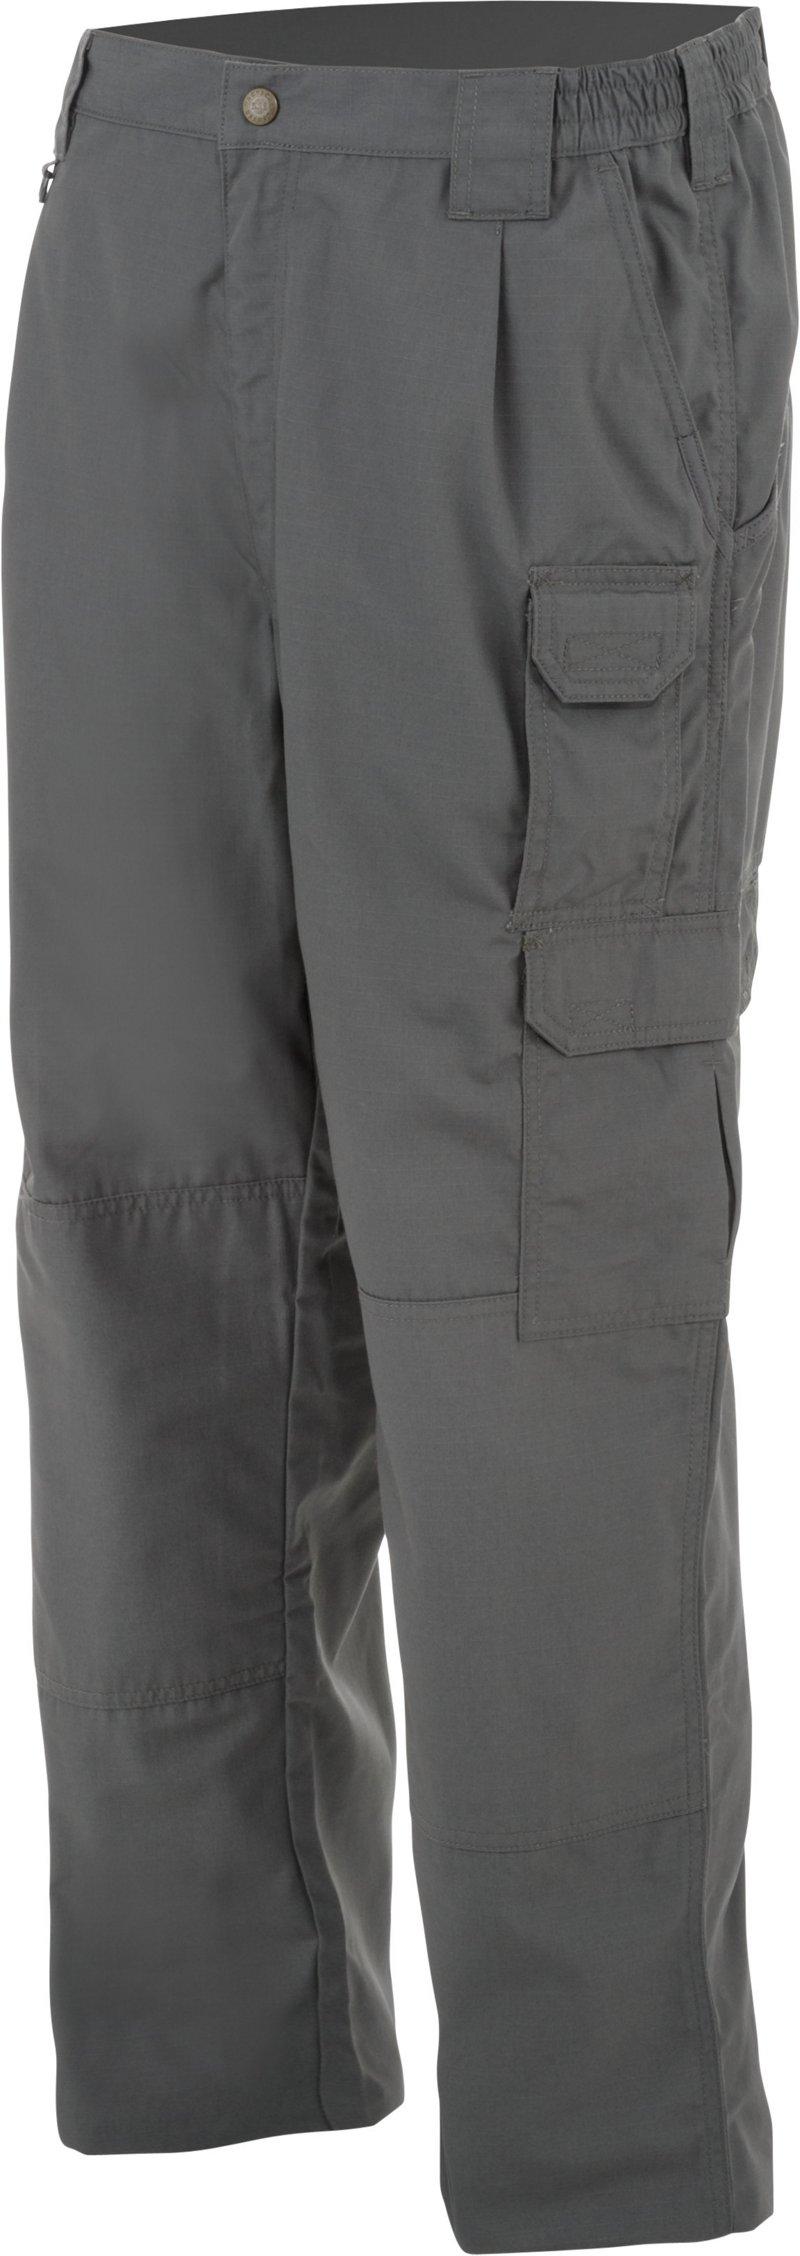 "5.11 Tactical Adults' Taclite Pro Pant (Storm, Size 32"") - Men's Outdoor Apparel, Men's Outdoor Pants at Academy Sports thumbnail"